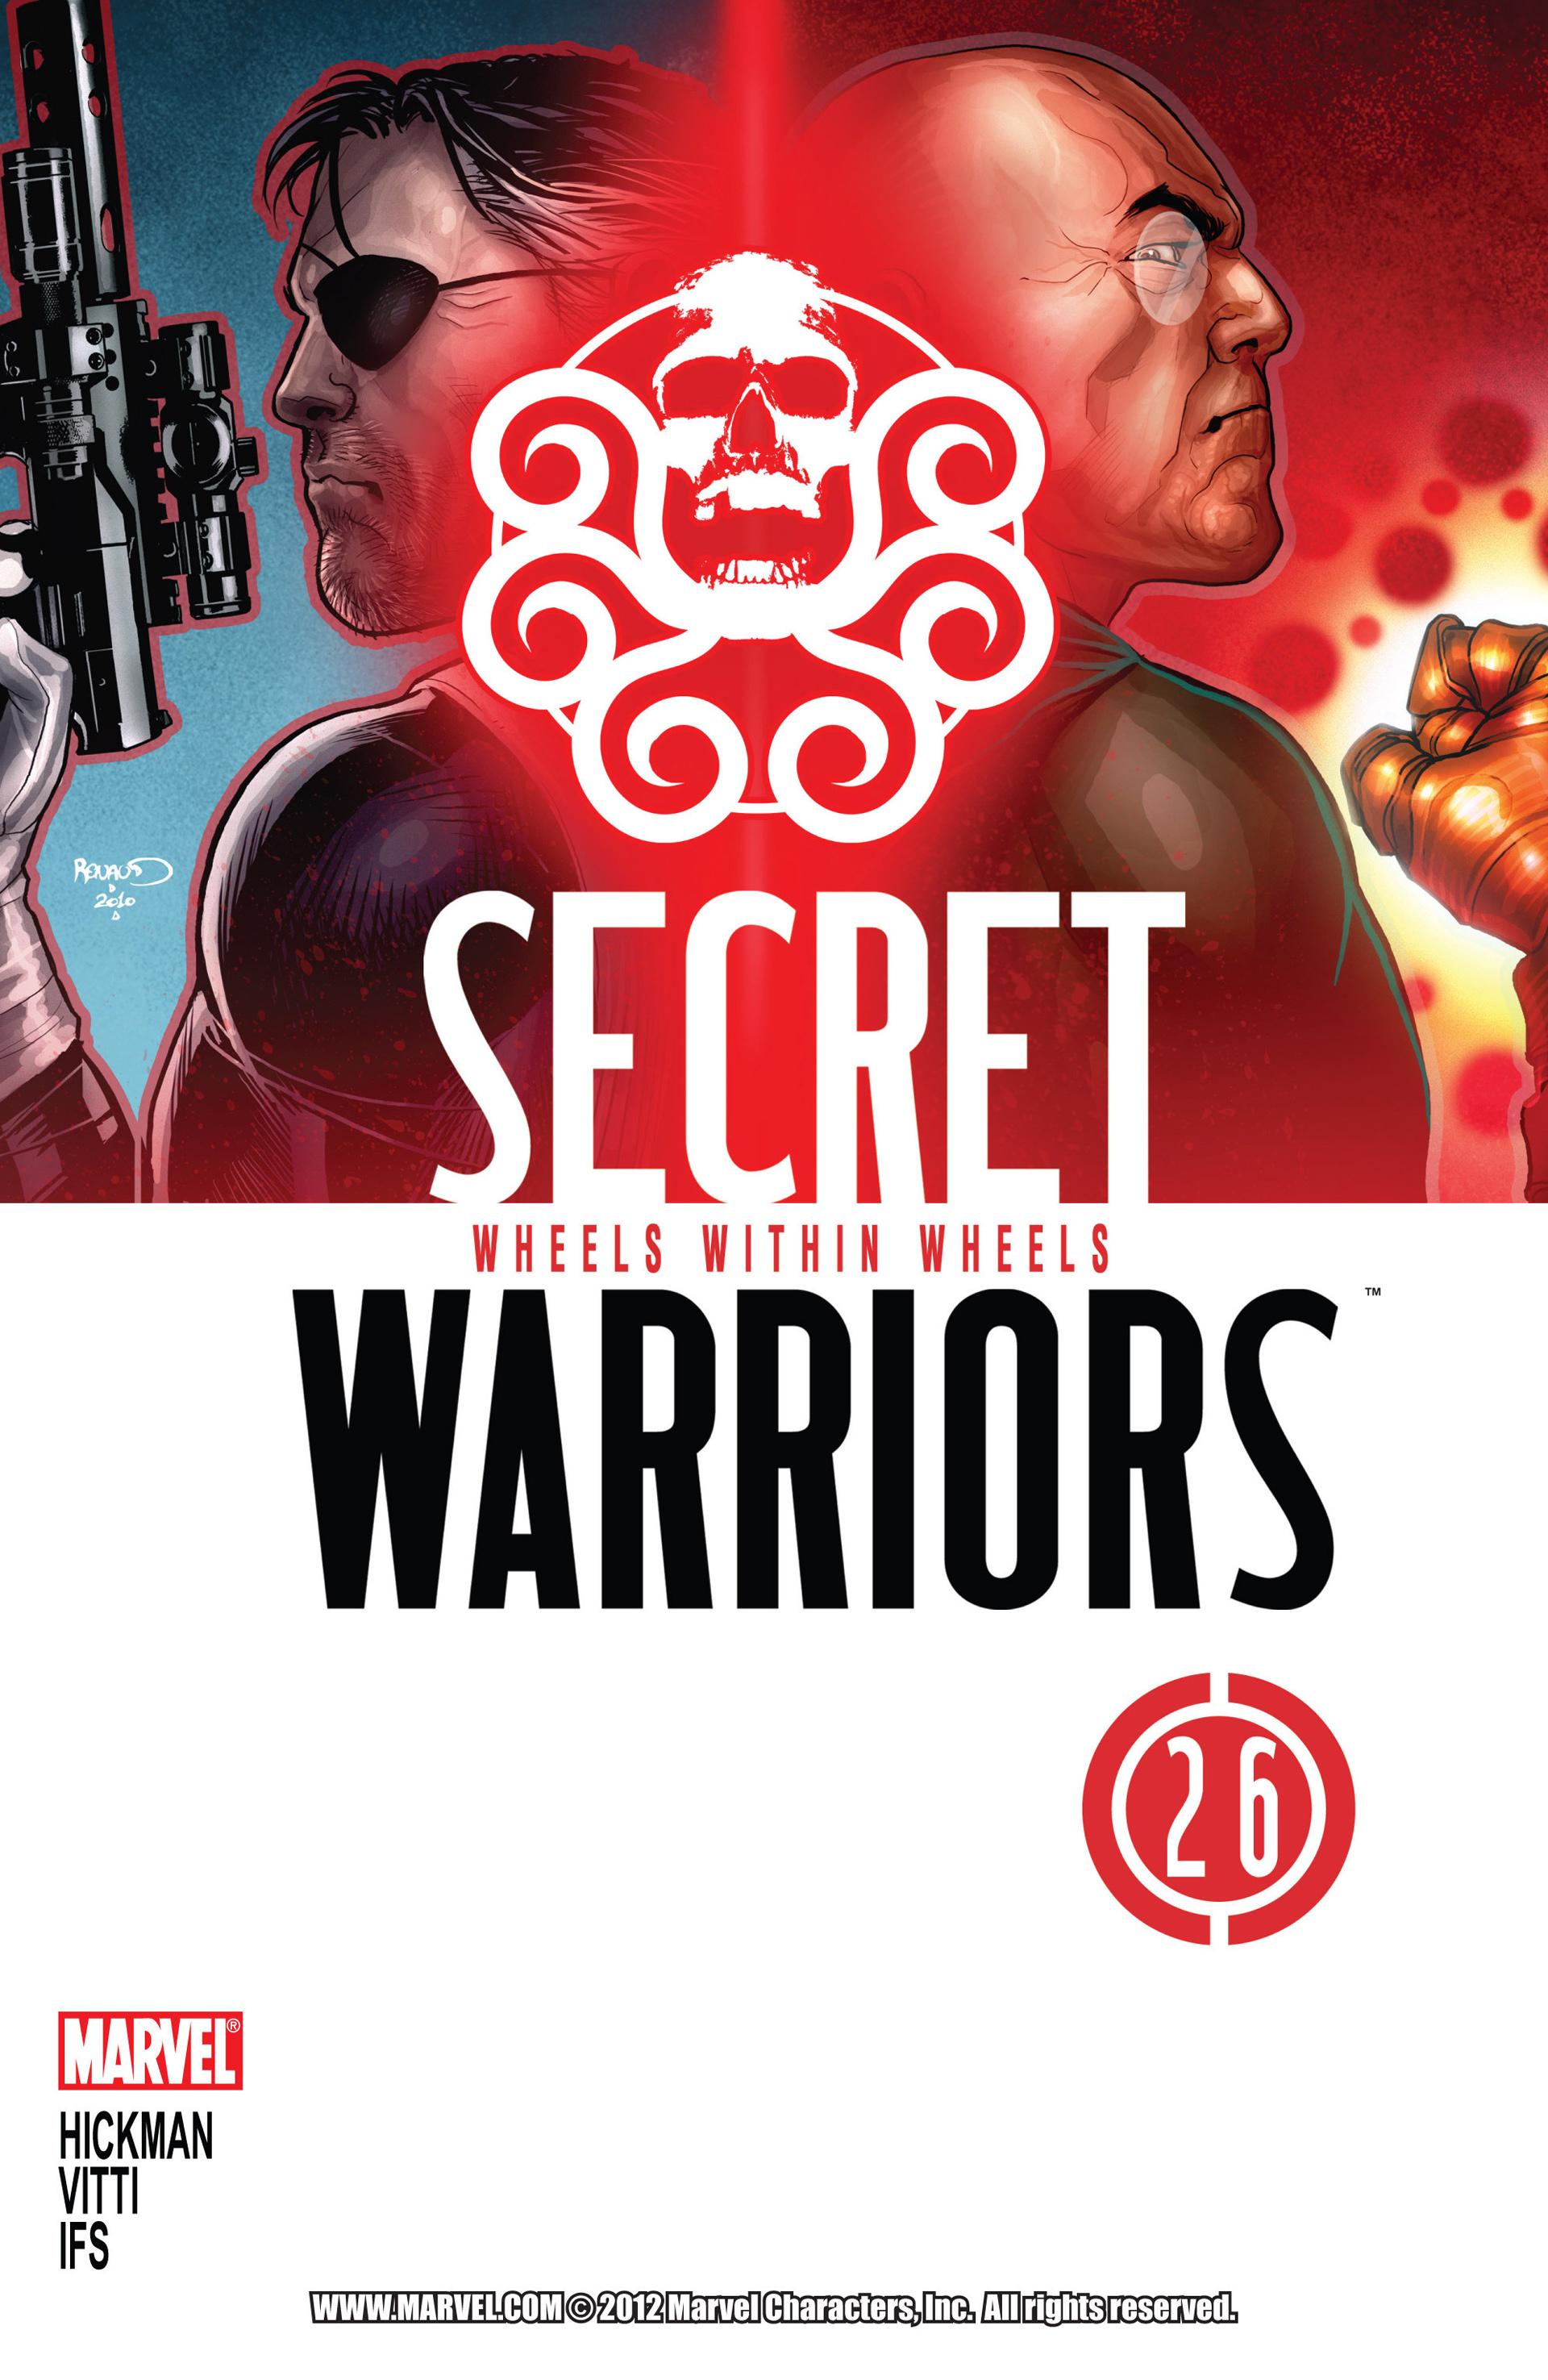 Read online Secret Warriors comic -  Issue #26 - 2